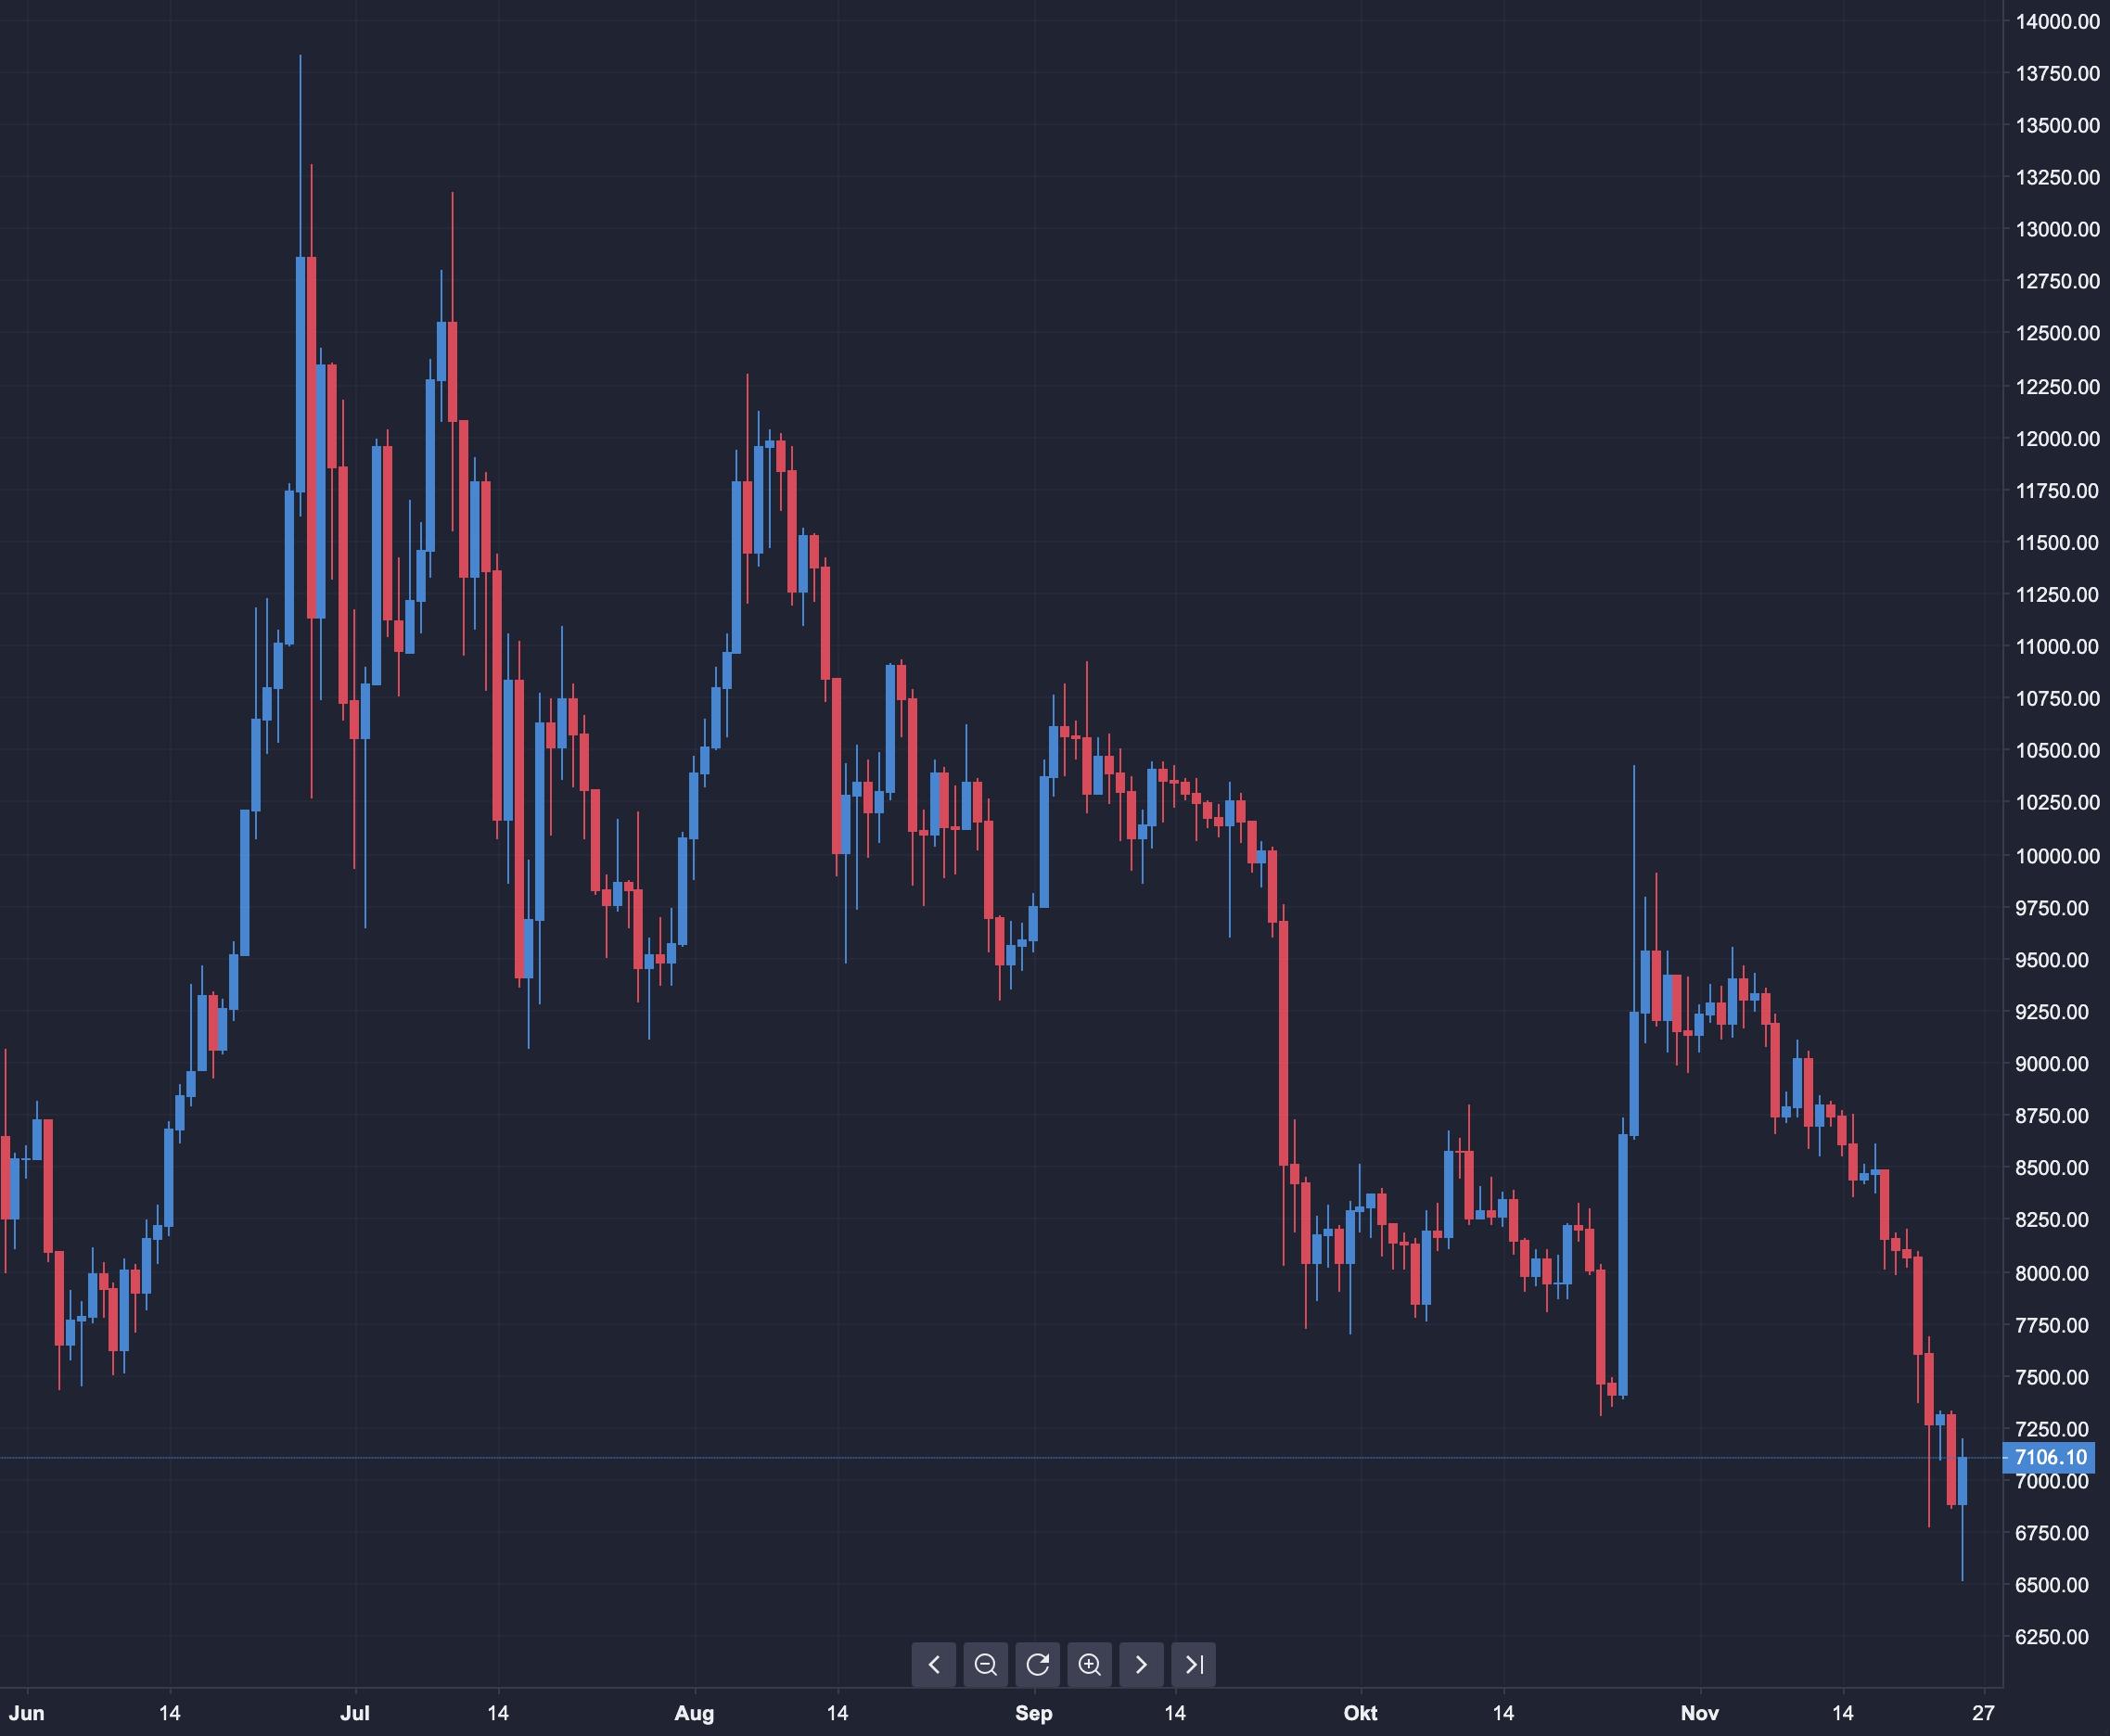 Bitcoin Chartverlauf seit Juni